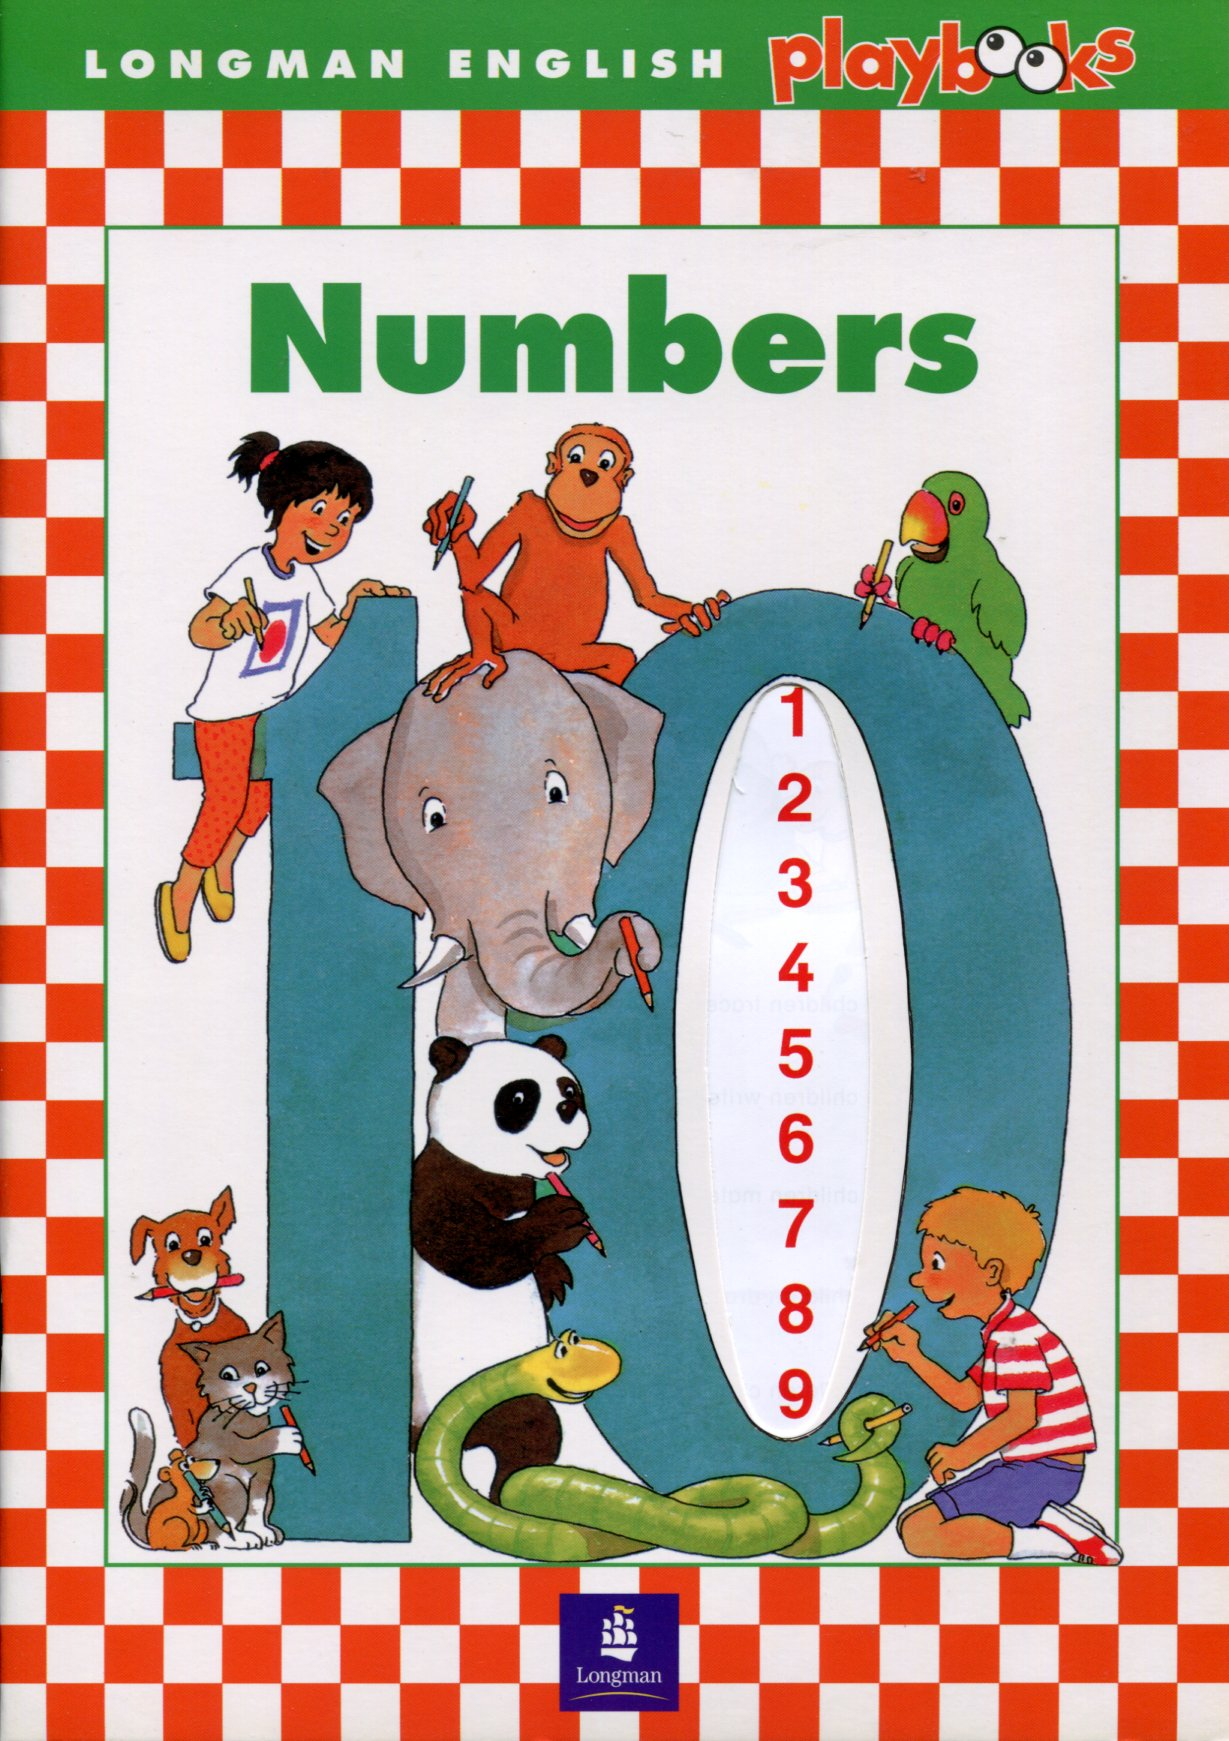 Longman English Playbooks: Numbers